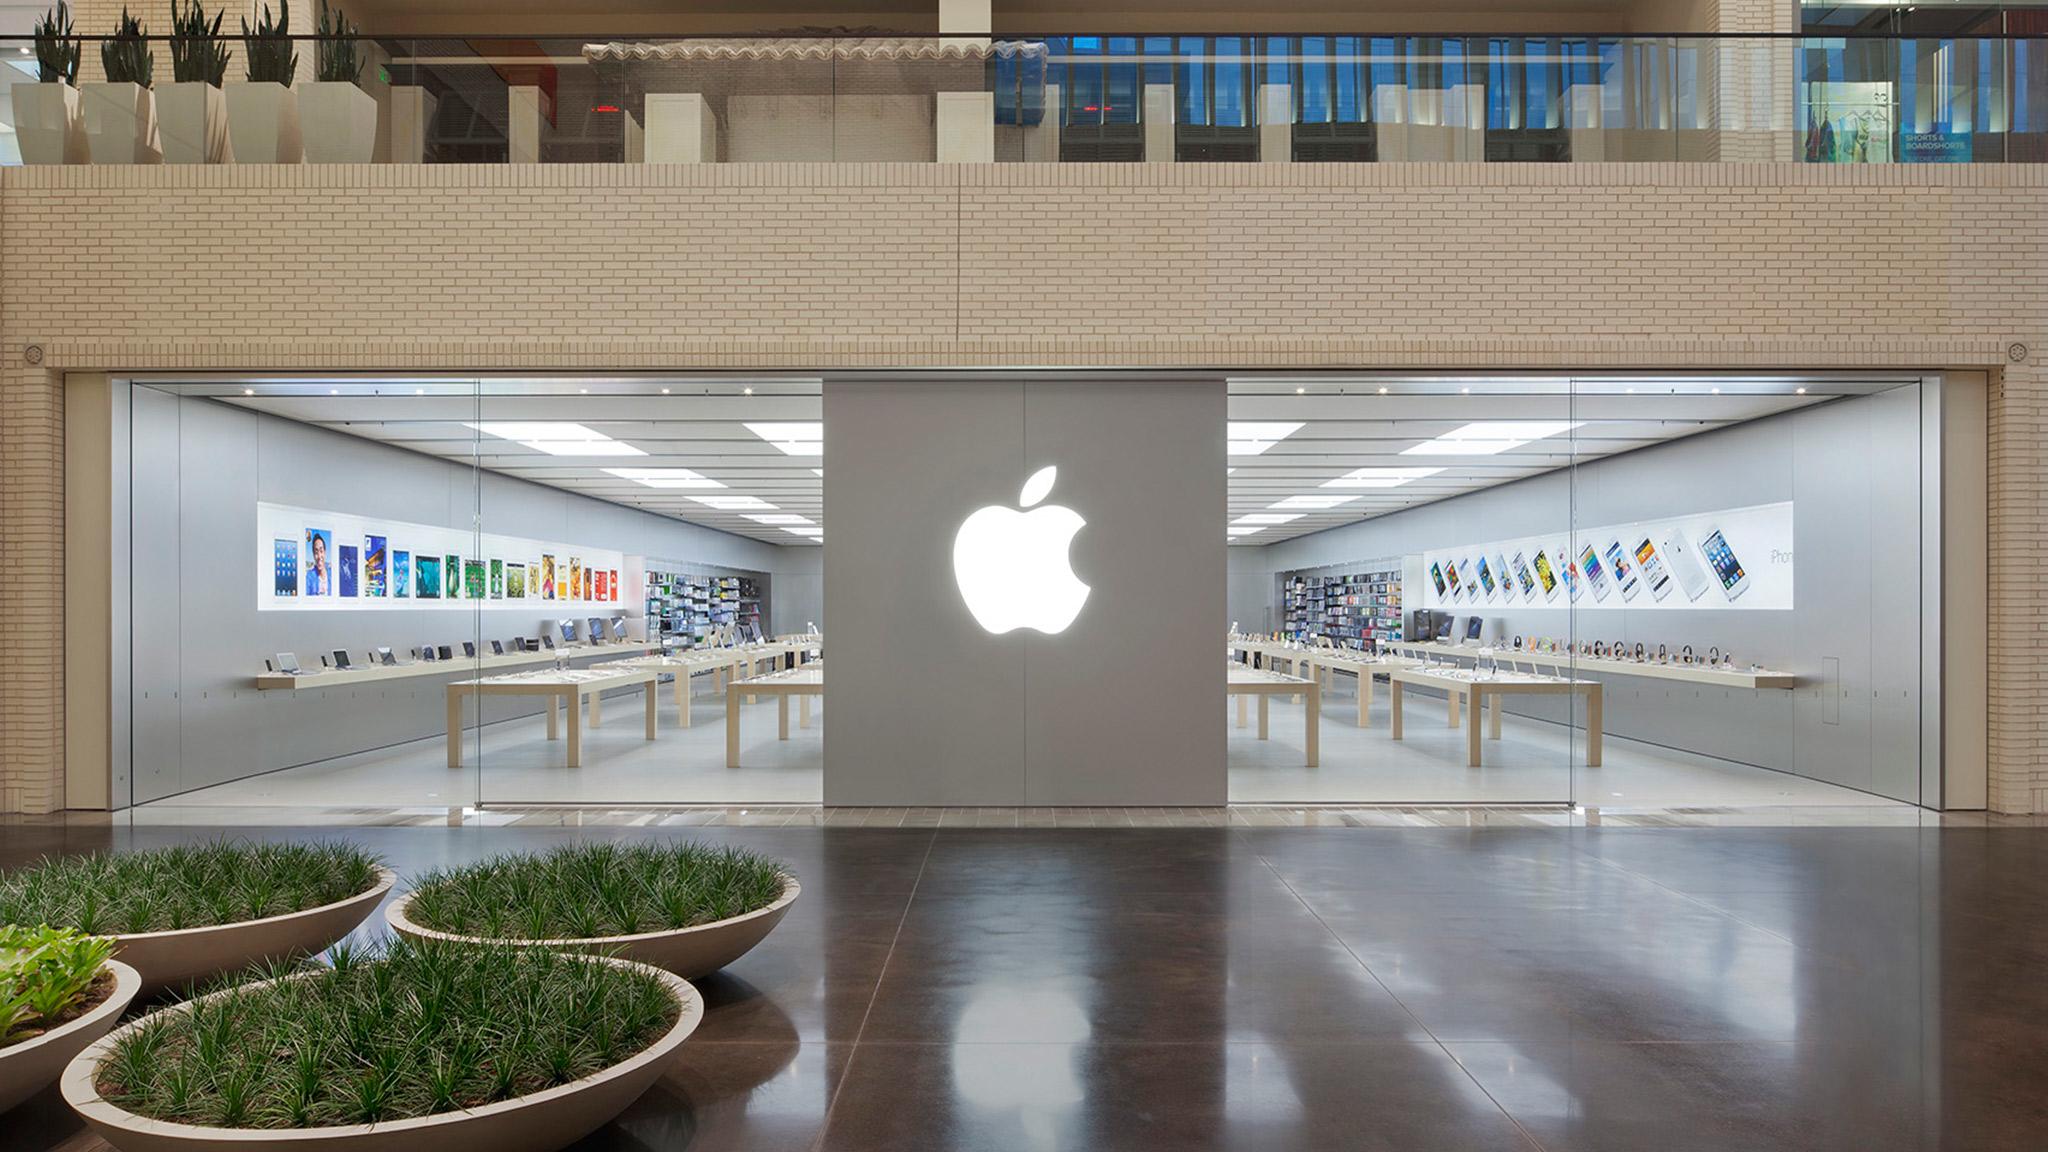 Apple NorthPark Center image 0